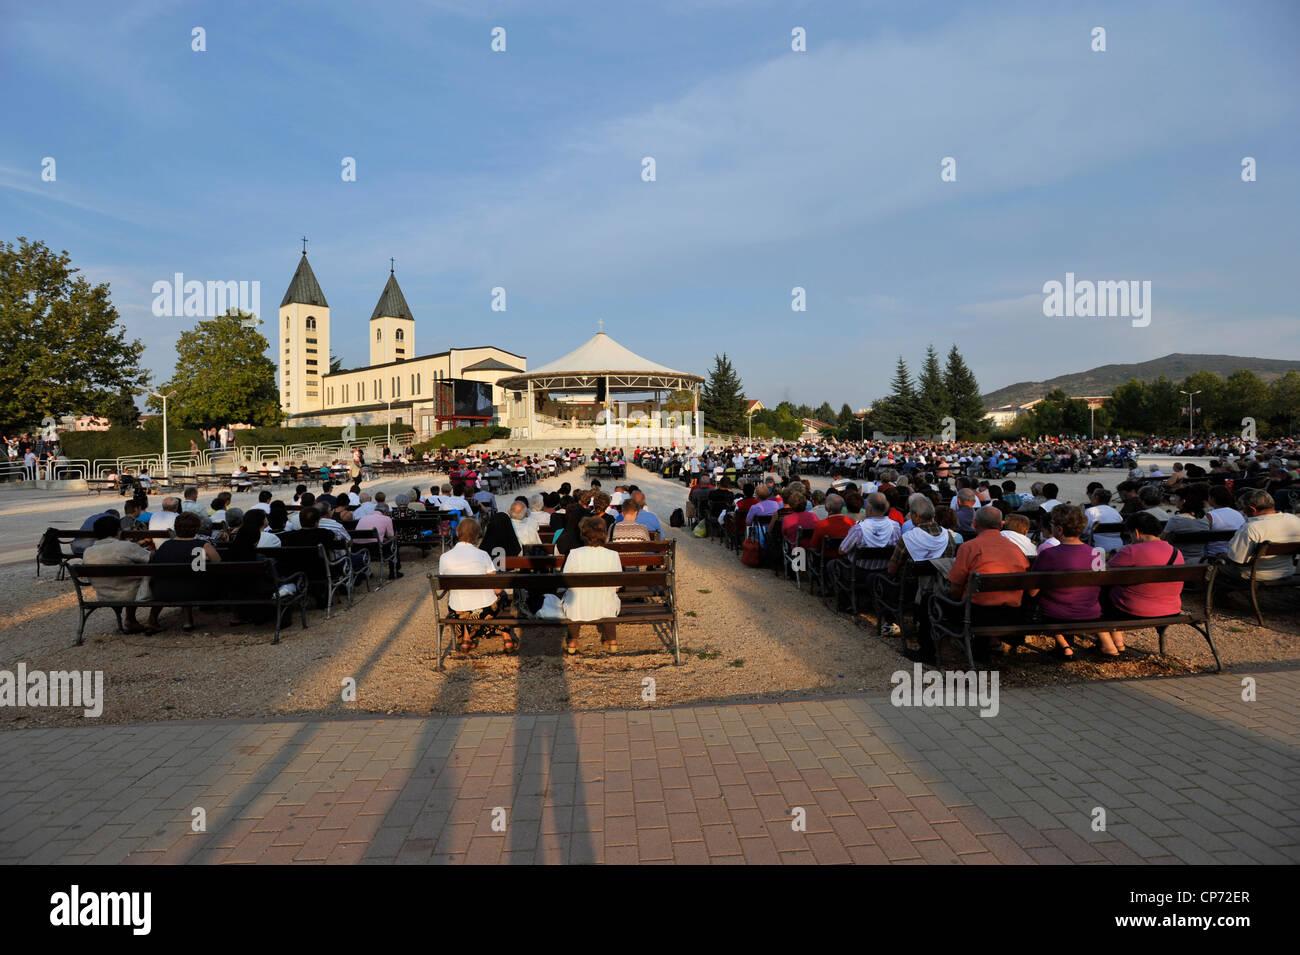 Europe Bosnia and Herzegovina Medjugorje Marian Shrine Church of Sy James Square of the Masses - Stock Image